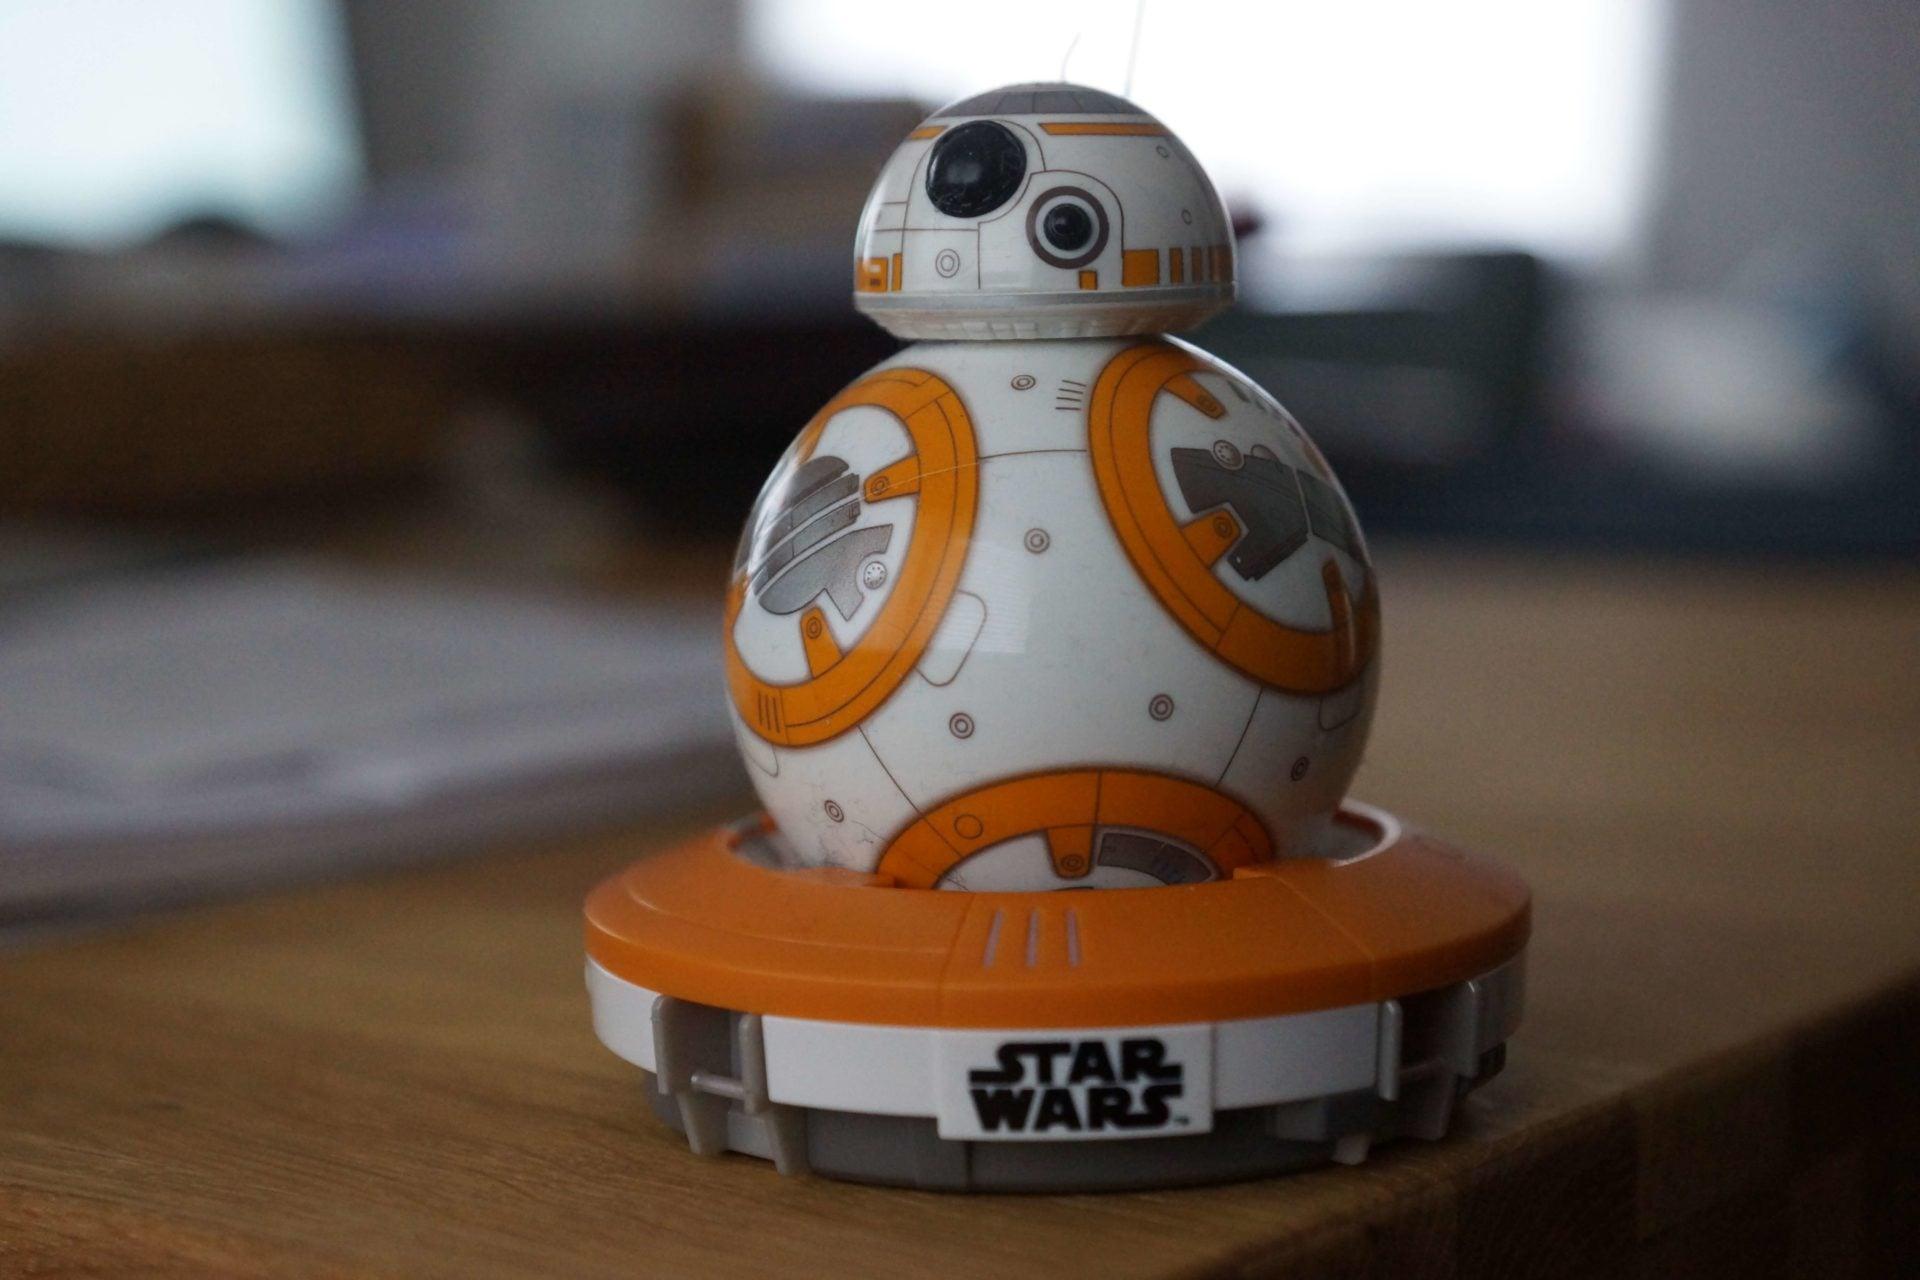 Sphero BB-8 Star Wars Droid Test 2 morethanandroid.de Sphero BB-8 Star Wars Droid Test